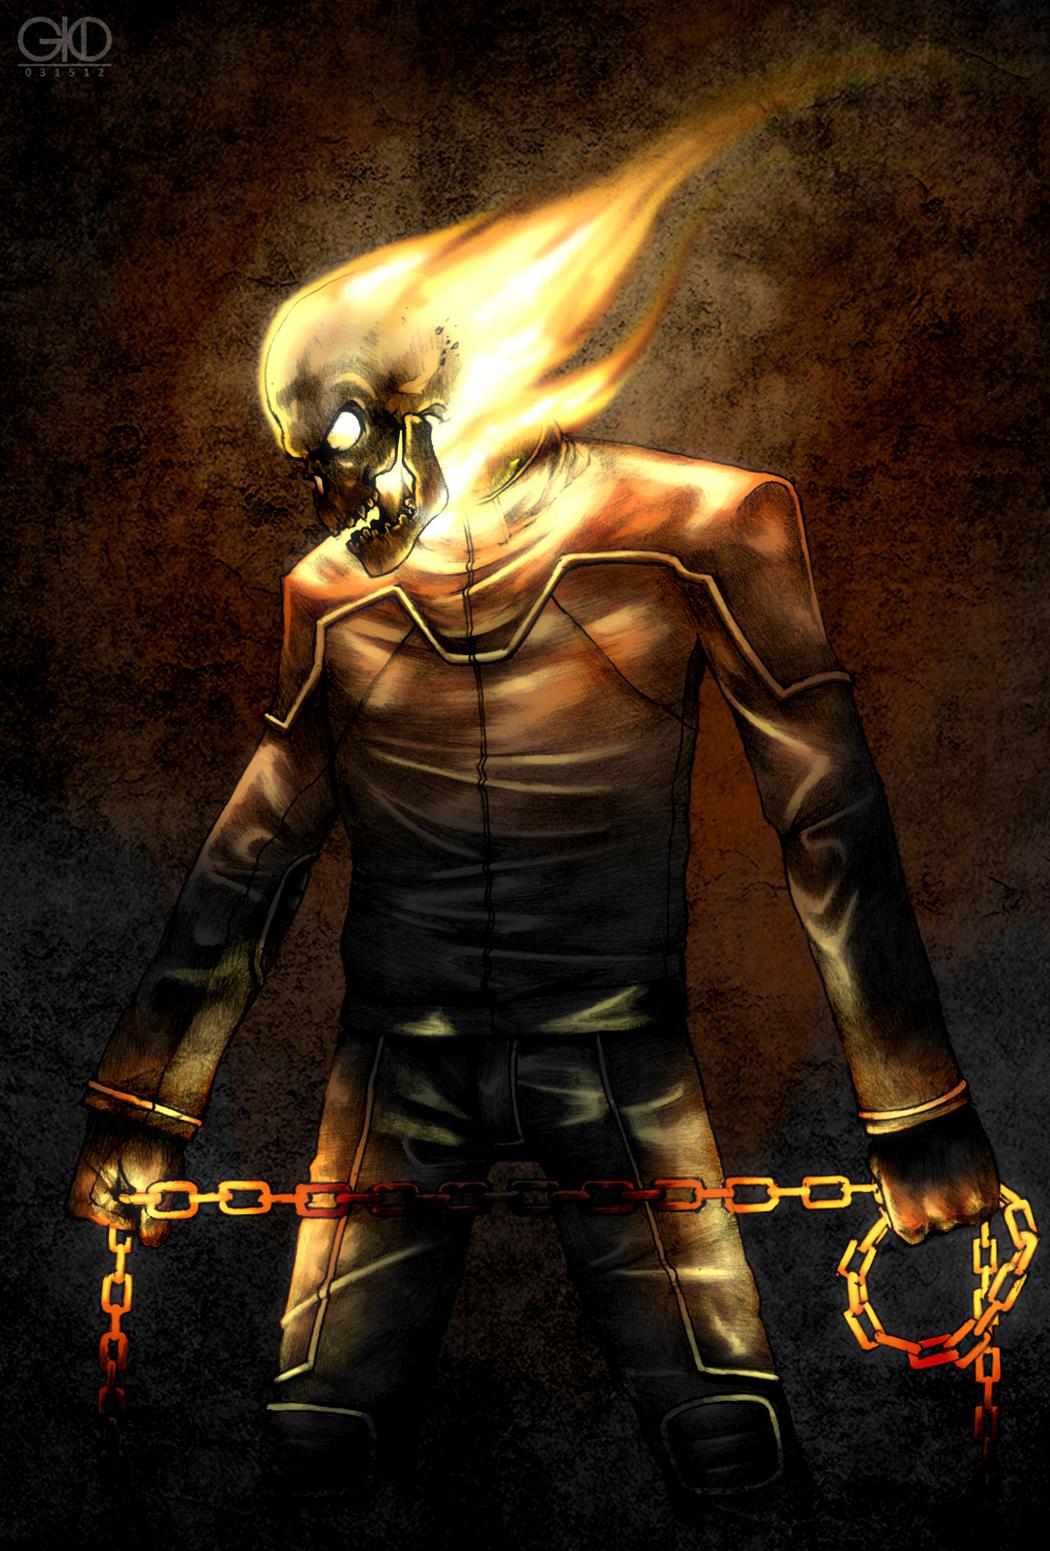 Ghost Rider: Vengeance by Gido on DeviantArt